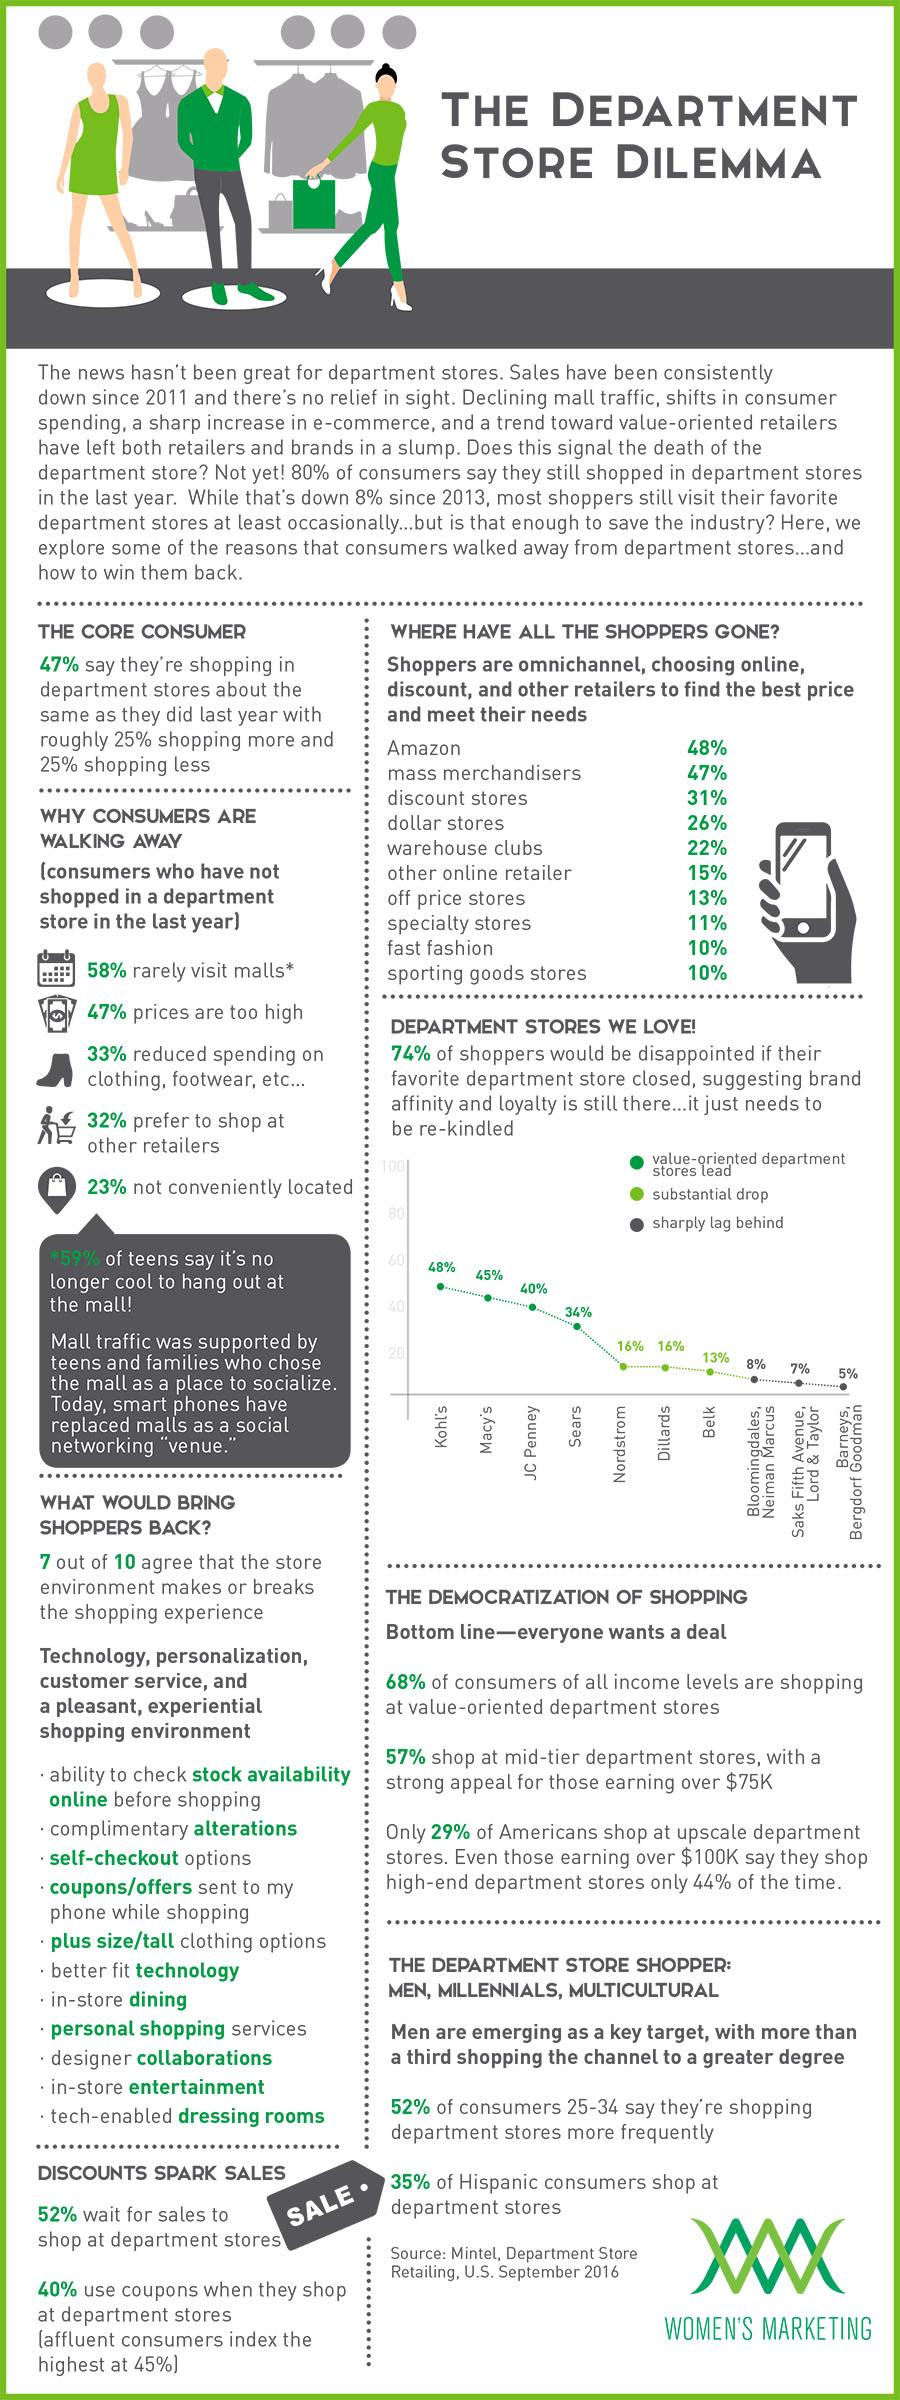 TheDepartmentStoreDilemma_Infographic.jpg